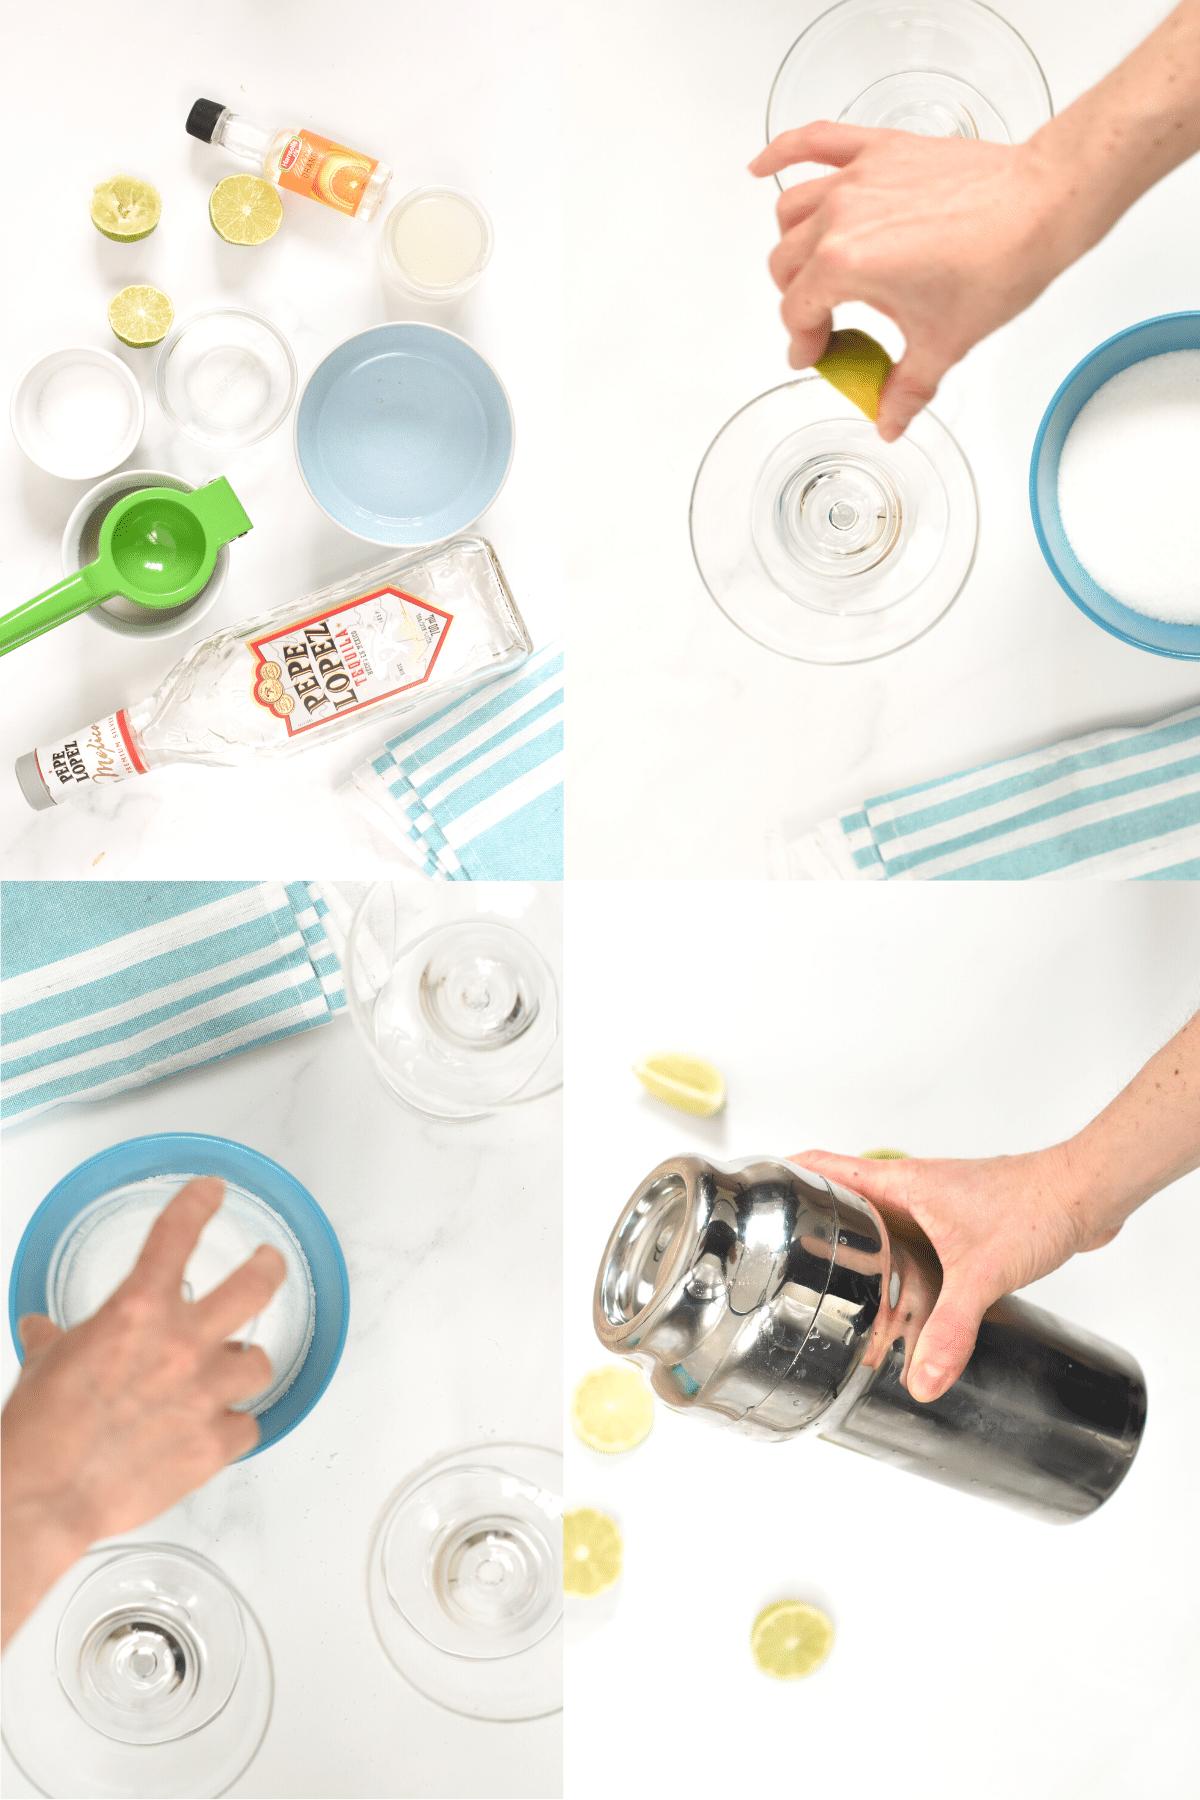 How to make Keto Margarita